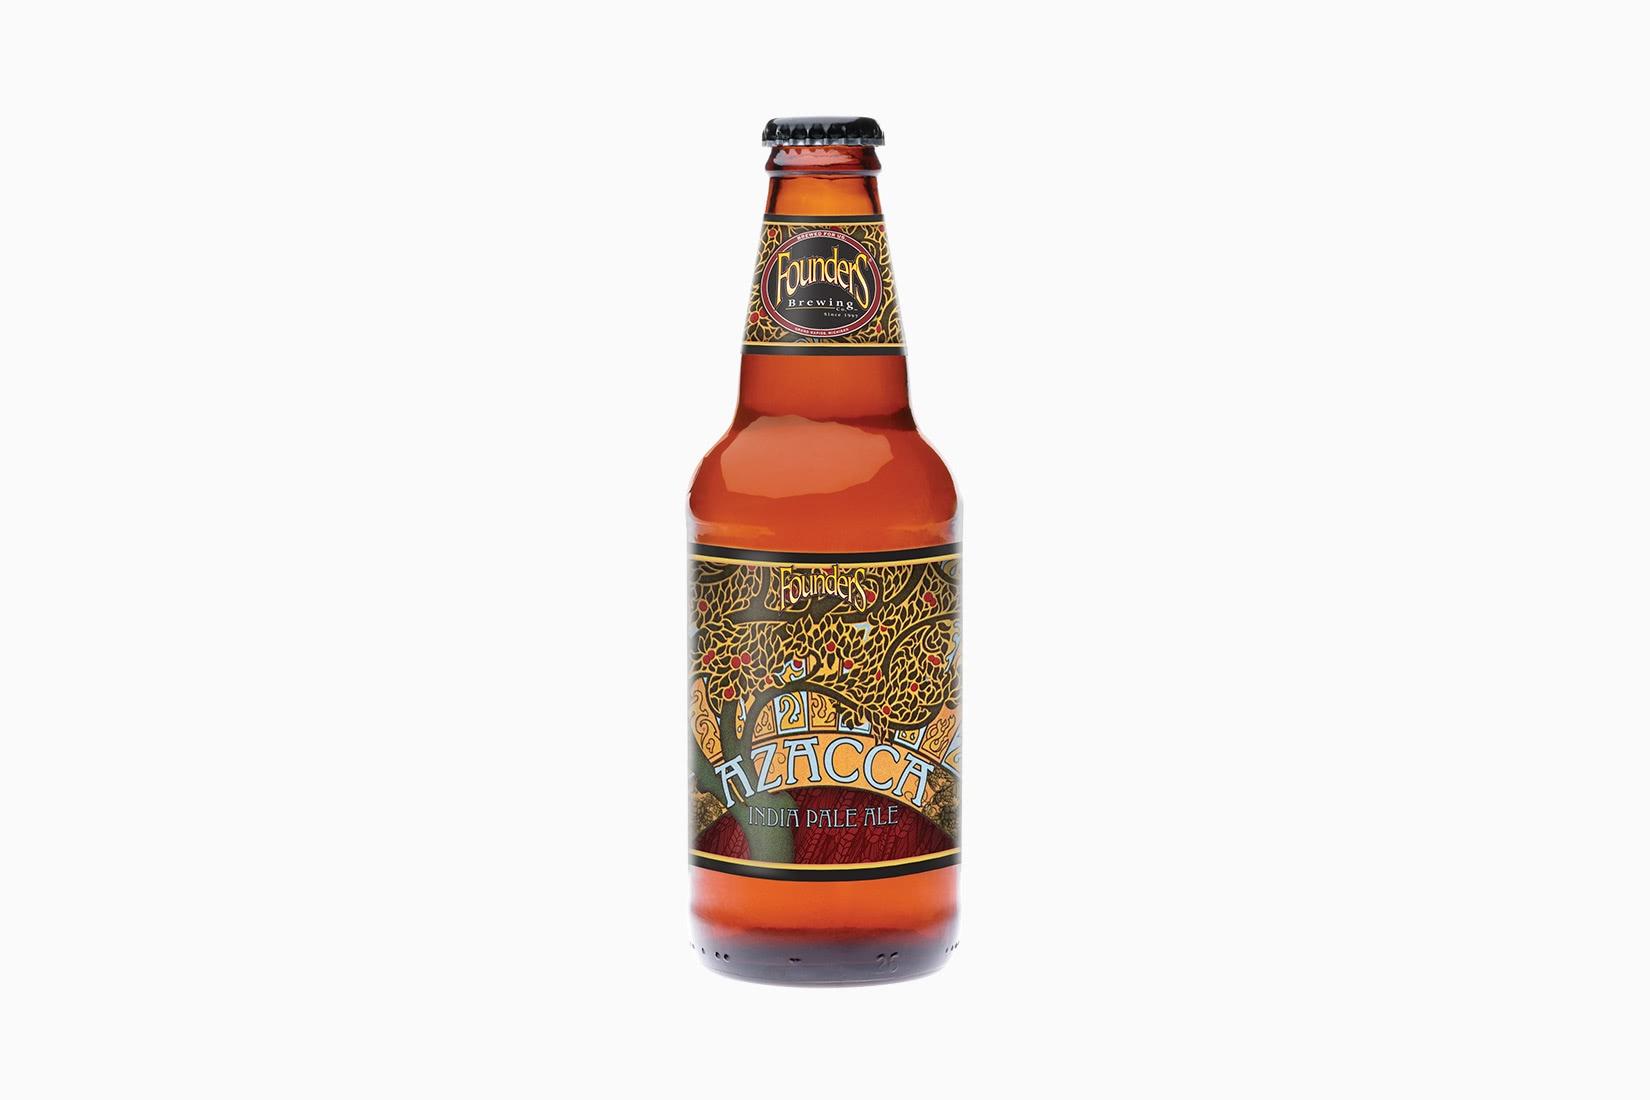 best beer brands founders brewing co ipa - Luxe Digital